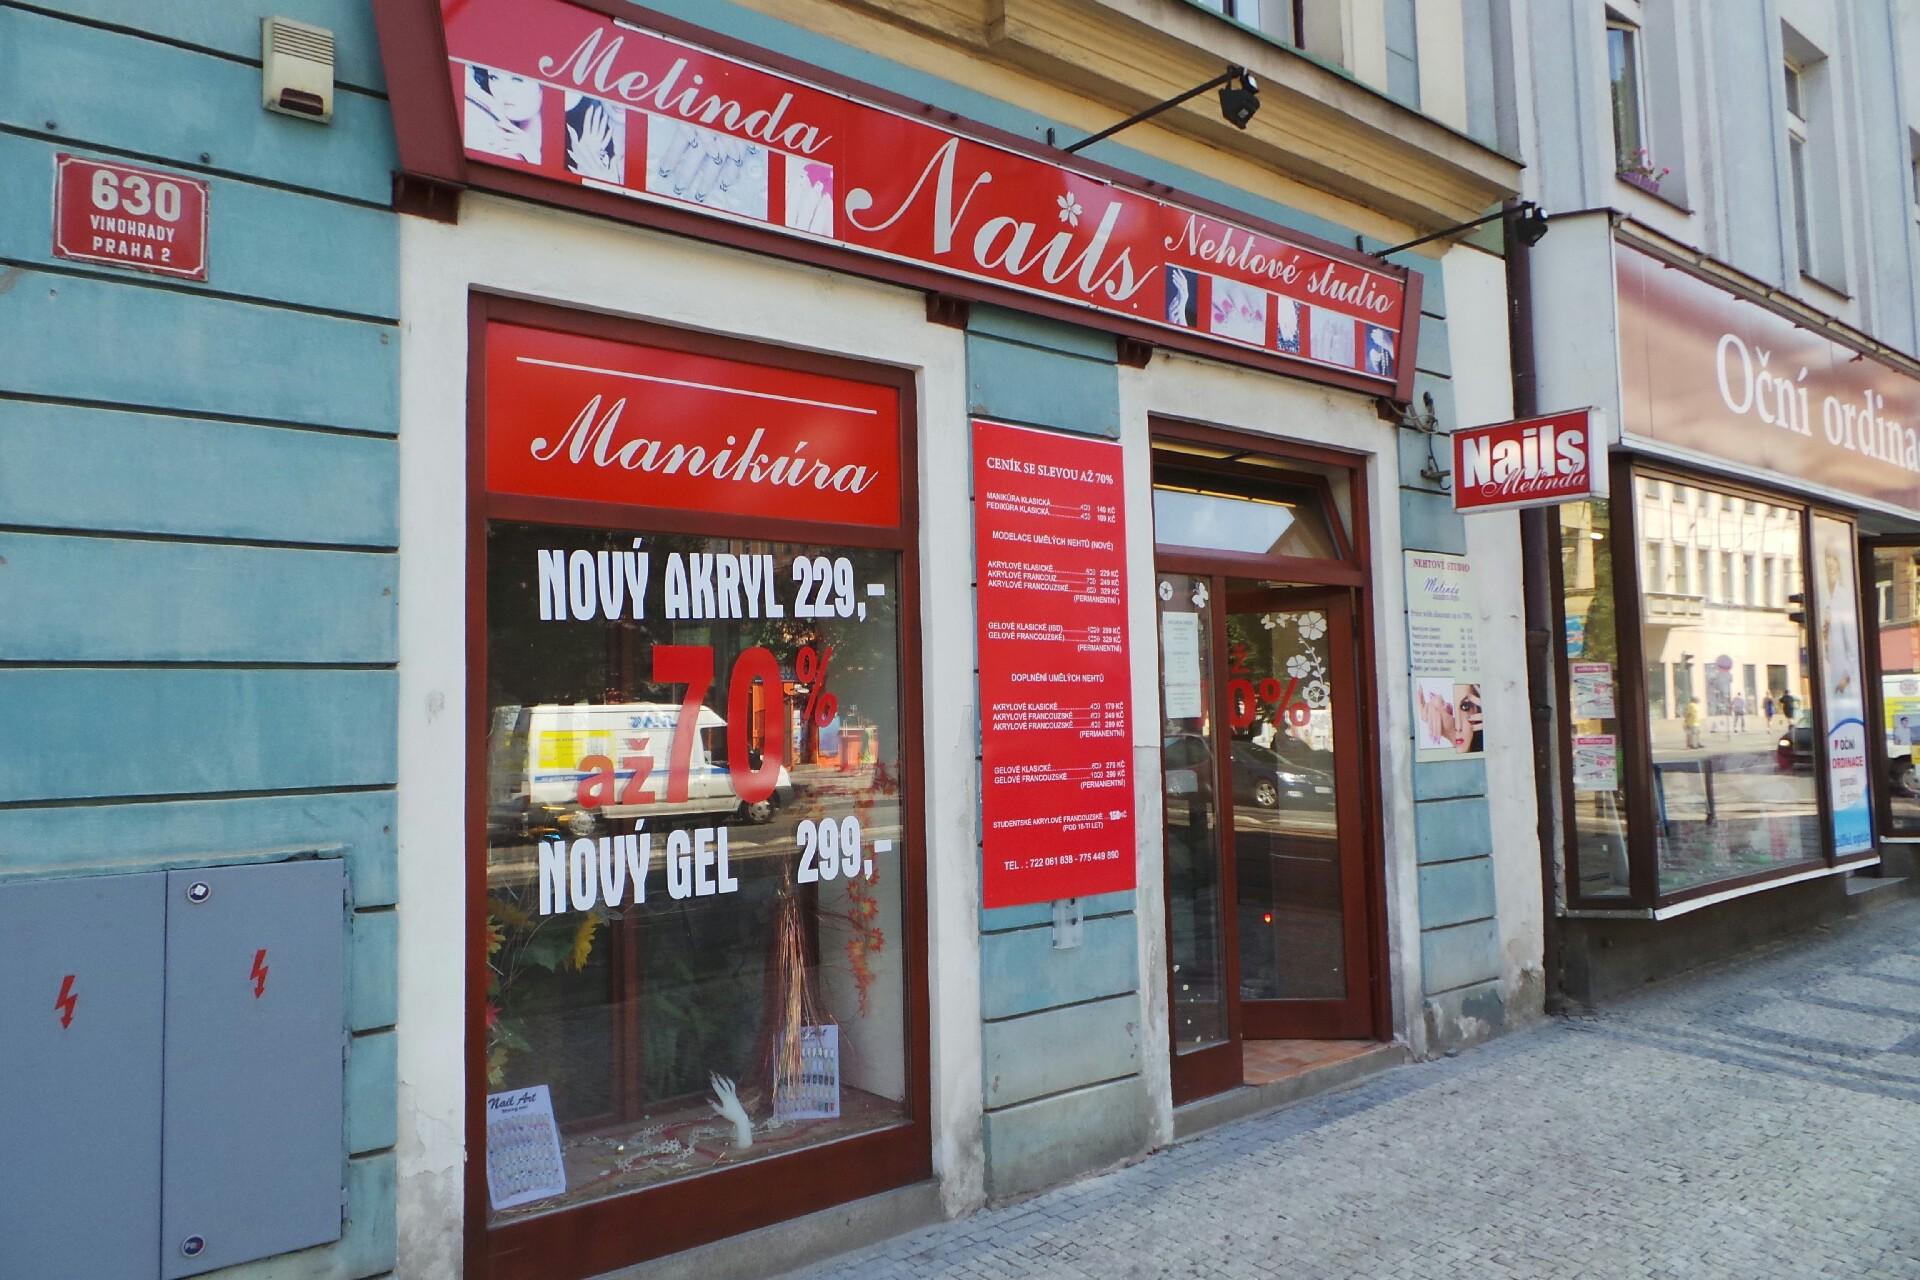 Melinda Nails Praha Firmy Cz